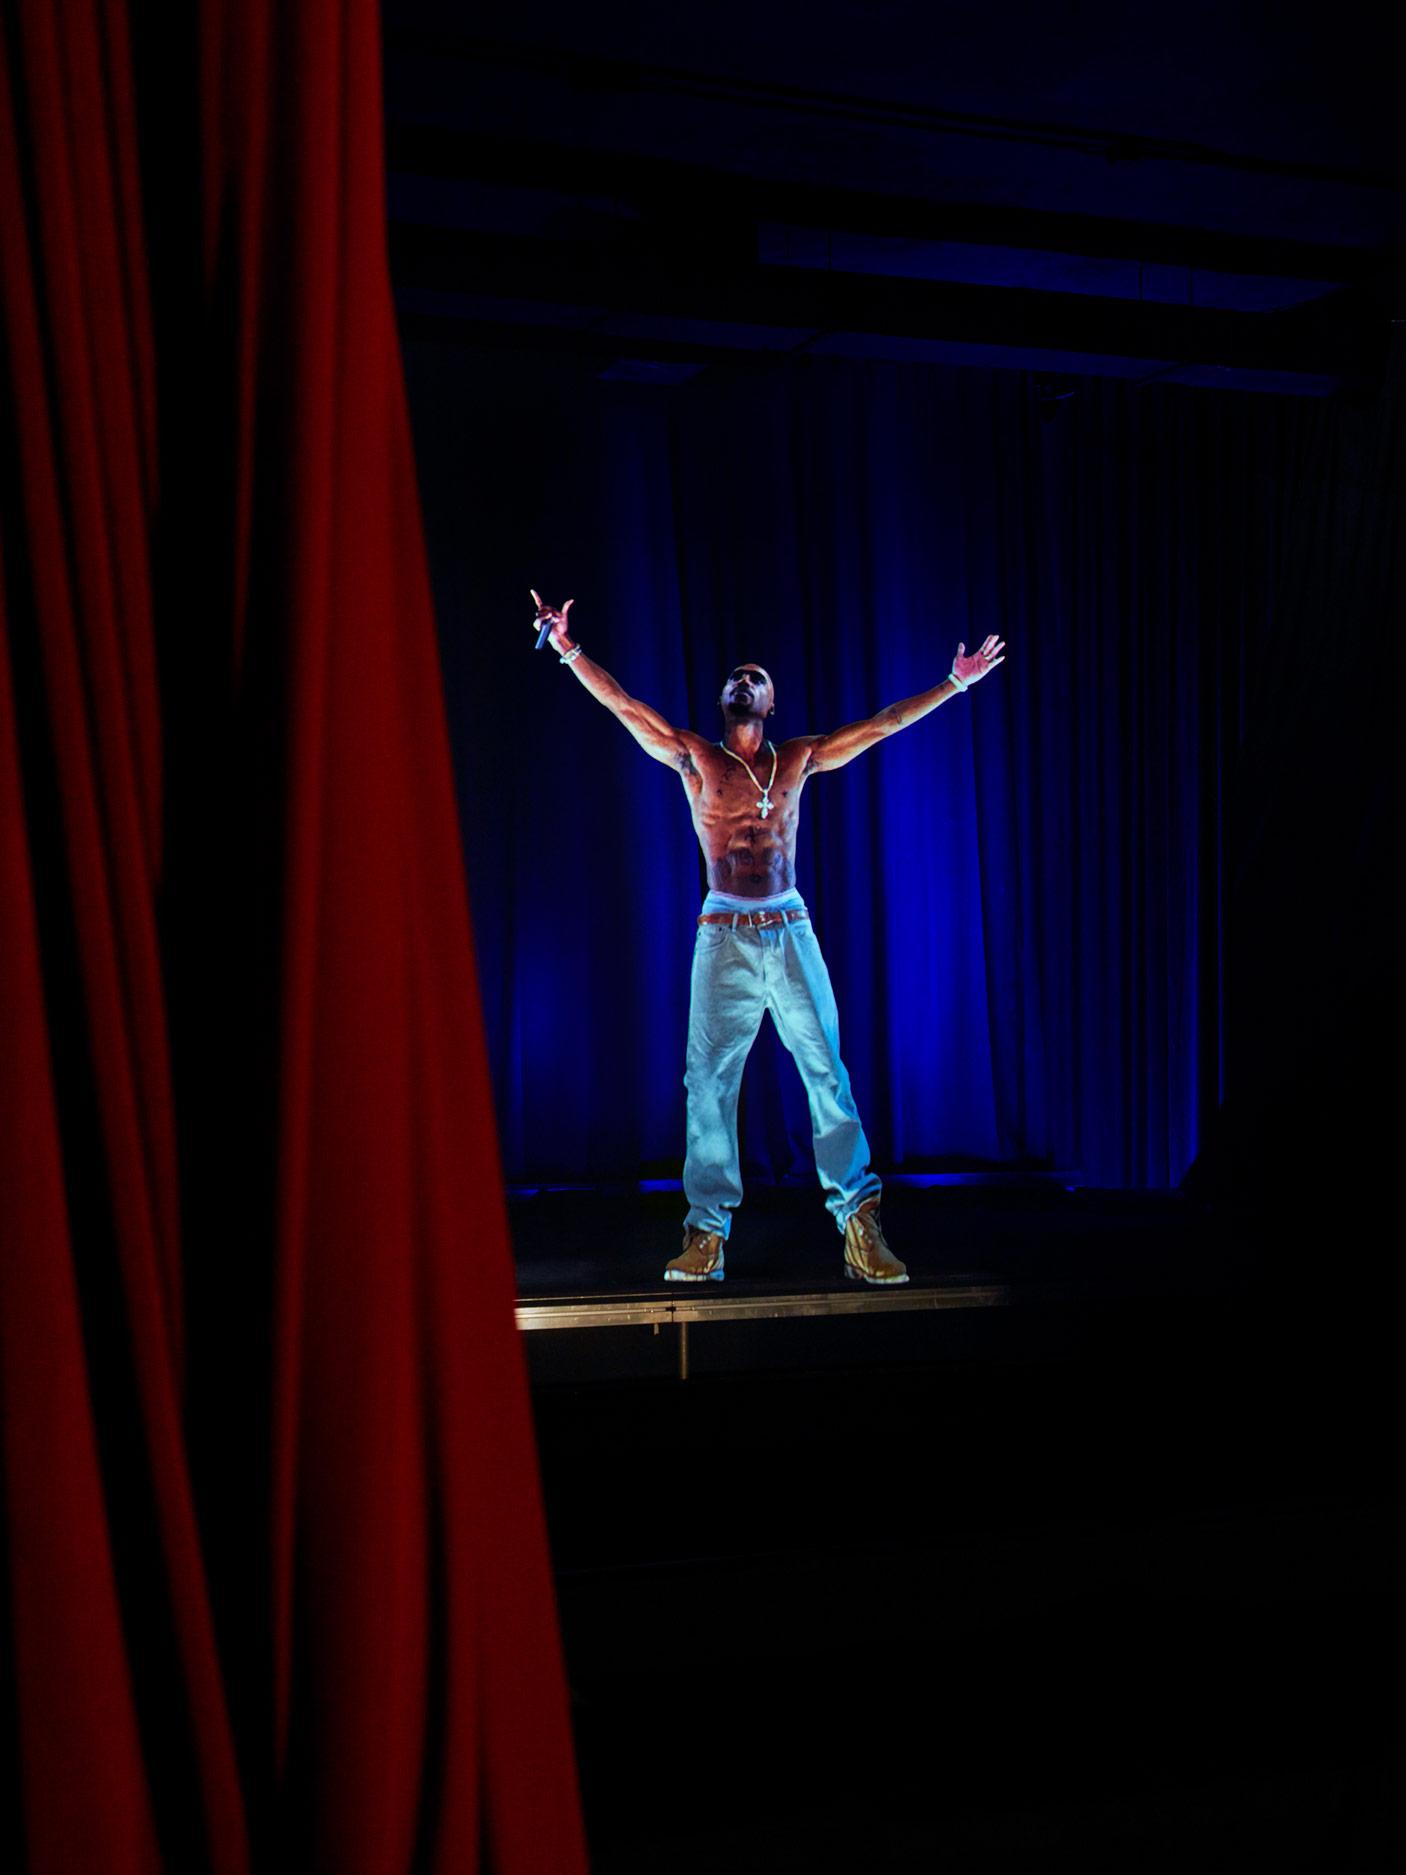 Holographic Tupac Shakur, Los Angeles, California, 2017